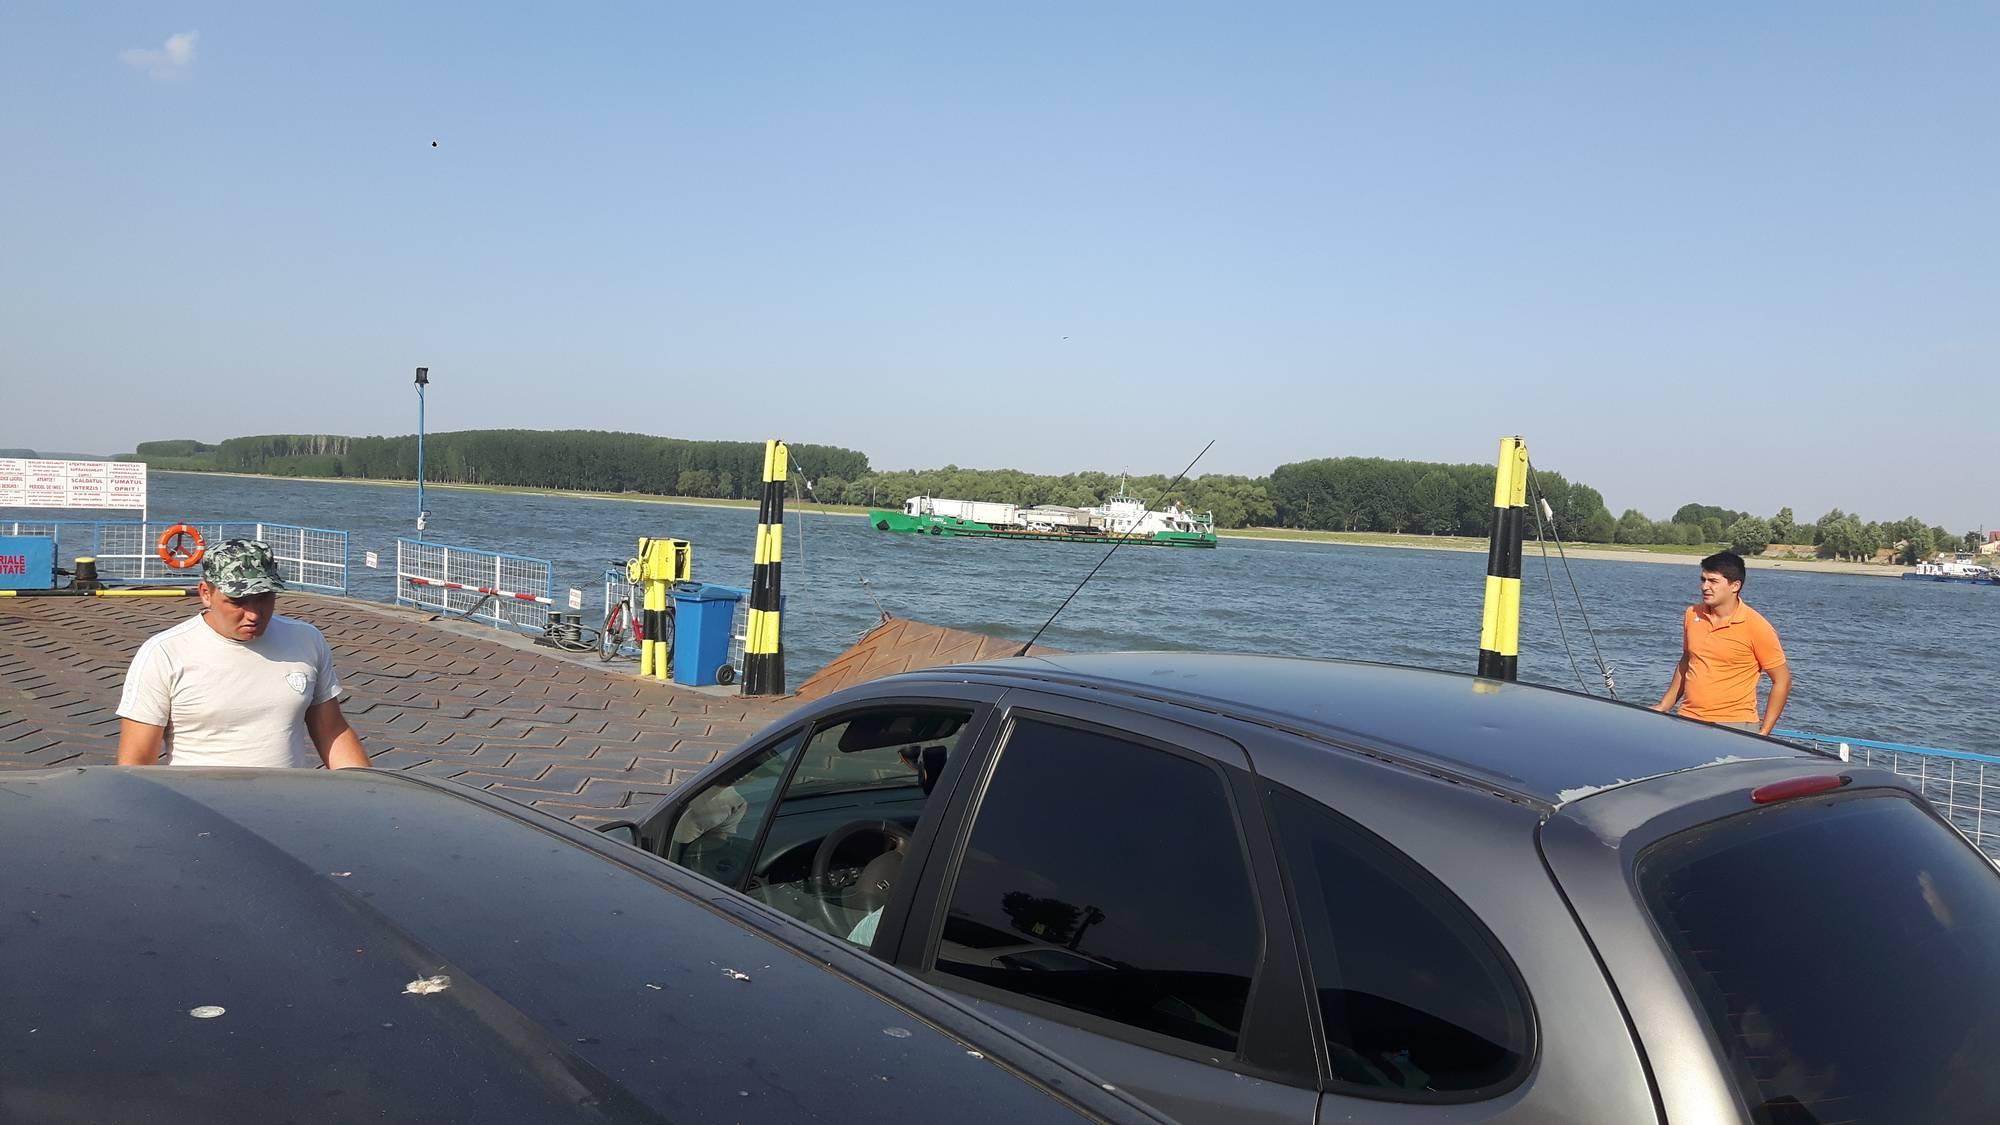 Traversee-Danube-bac_07-09-2018_02